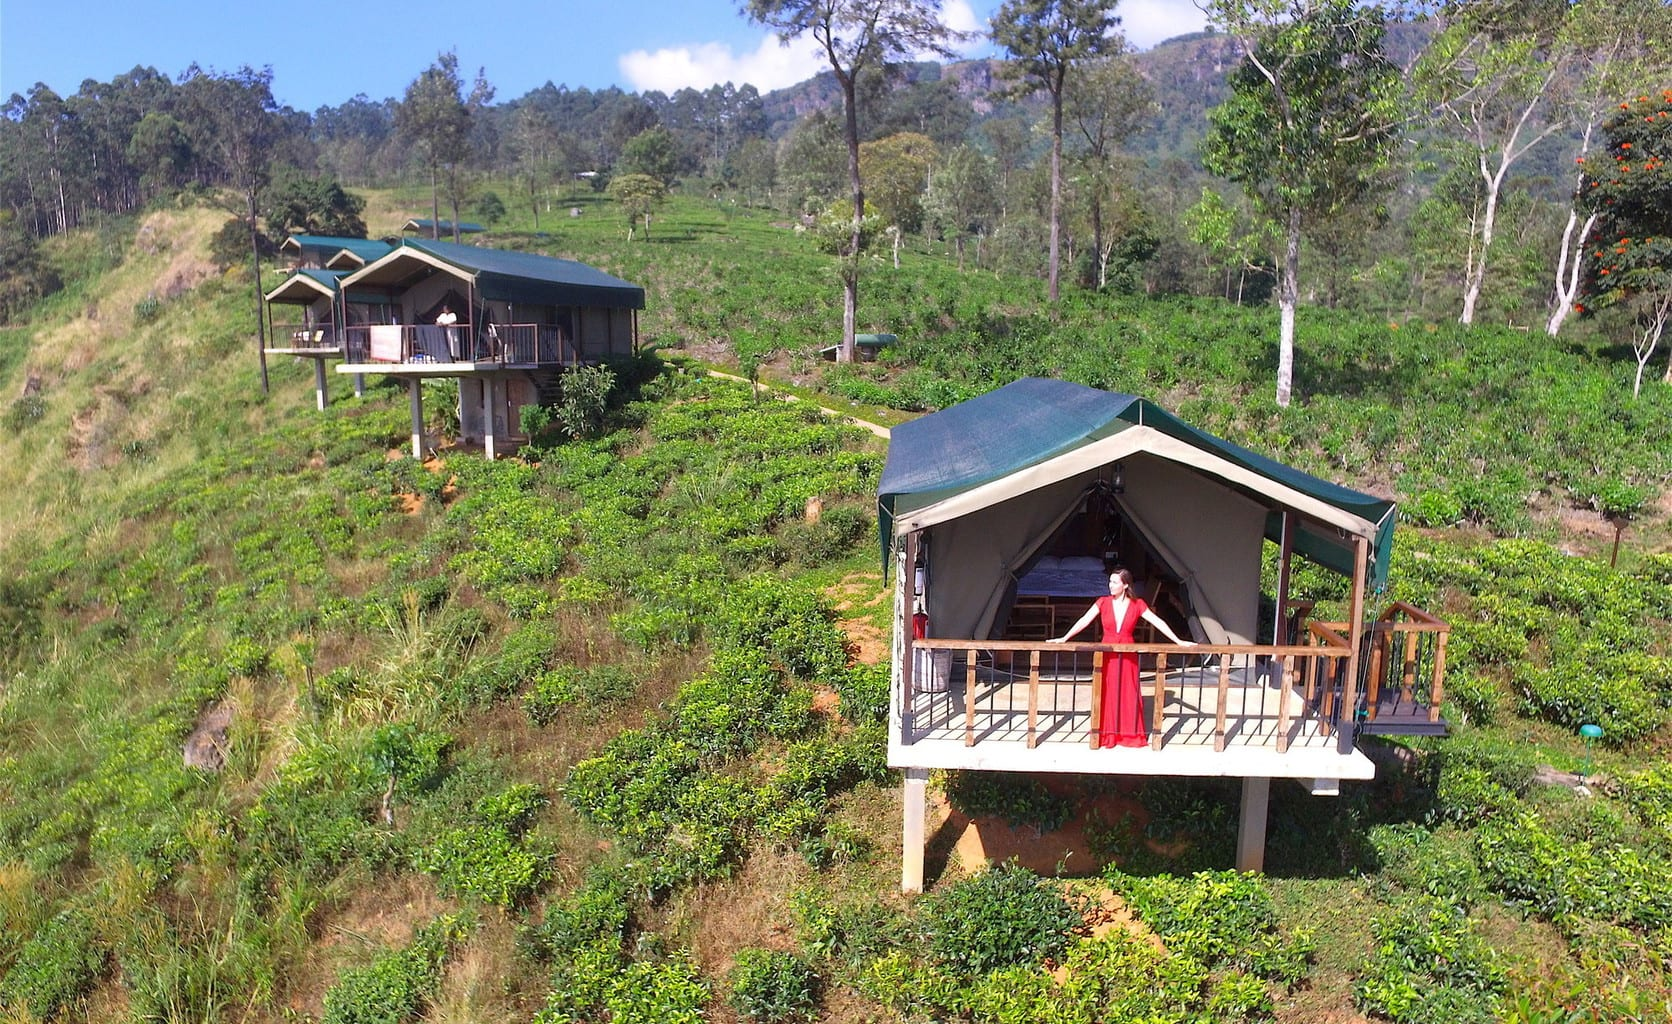 madulkelle tea and eco lodge glamping above kandy 39 s tea. Black Bedroom Furniture Sets. Home Design Ideas